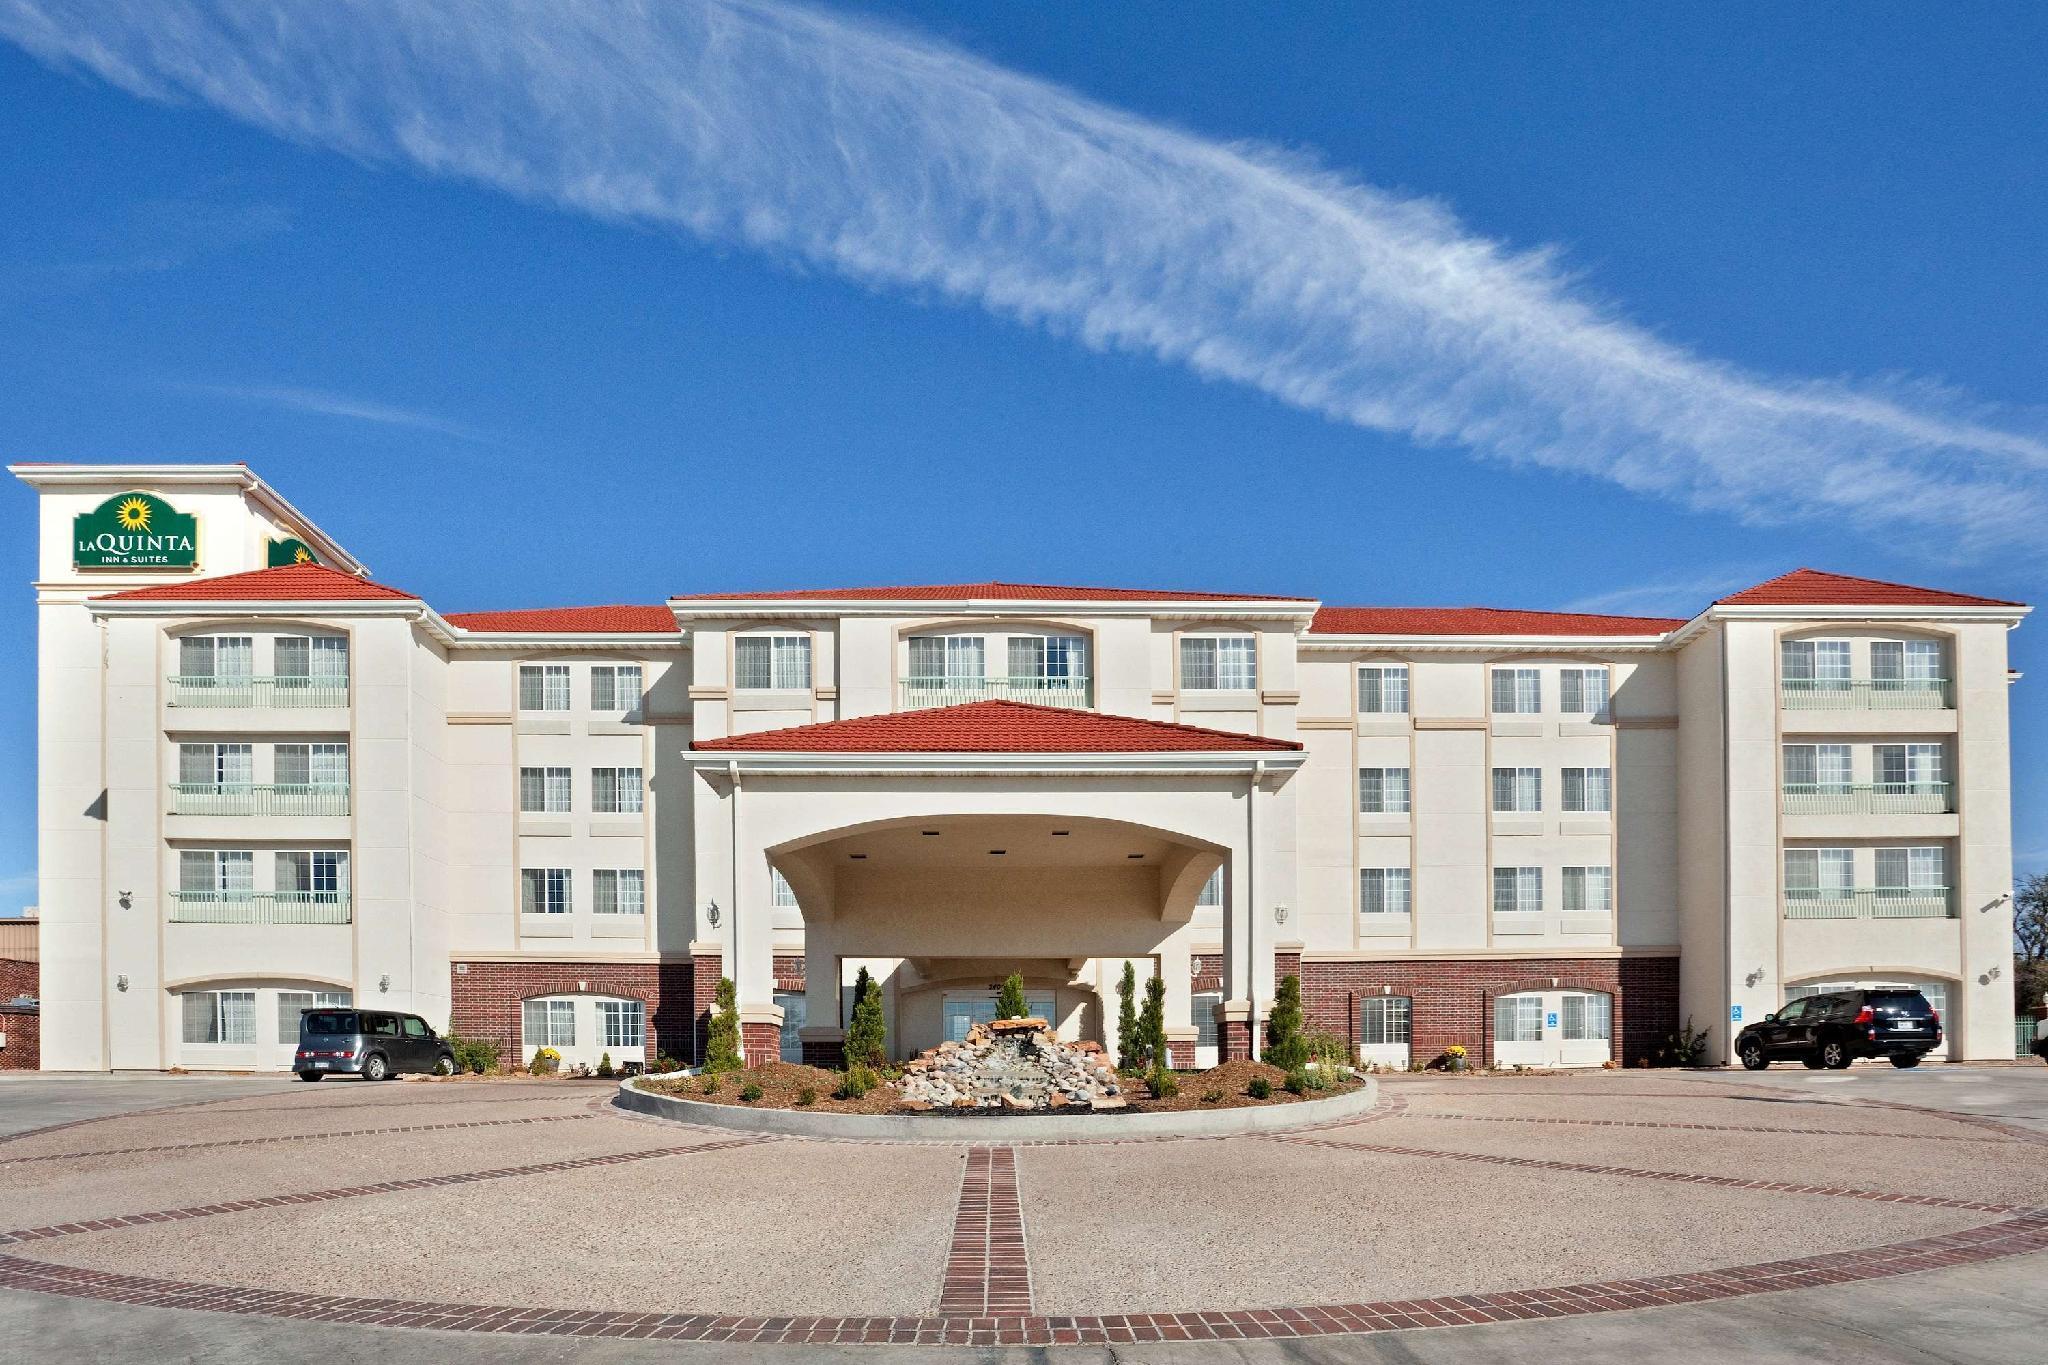 La Quinta Inn And Suites By Wyndham Dodge City